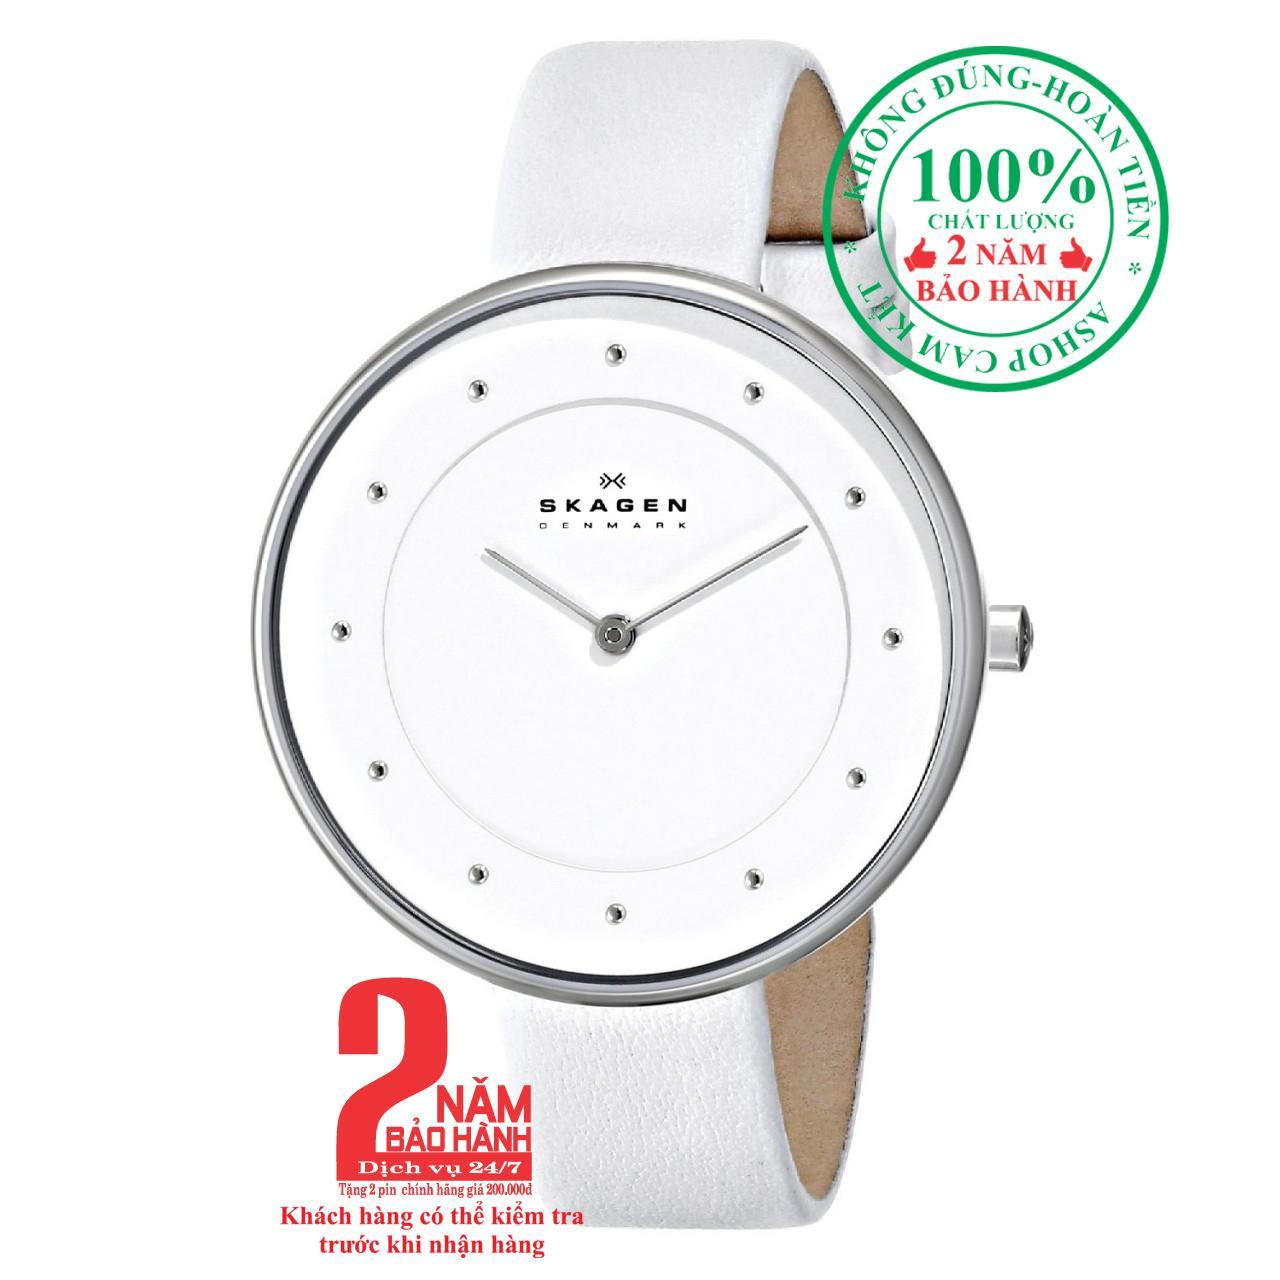 Nơi bán Đồng hồ nữ Skagen SKW2136, màu thép trắng(Stainless Steel), mặt trắng (White), dây da thật cao cấp, size 38mm - Model: SKW2136